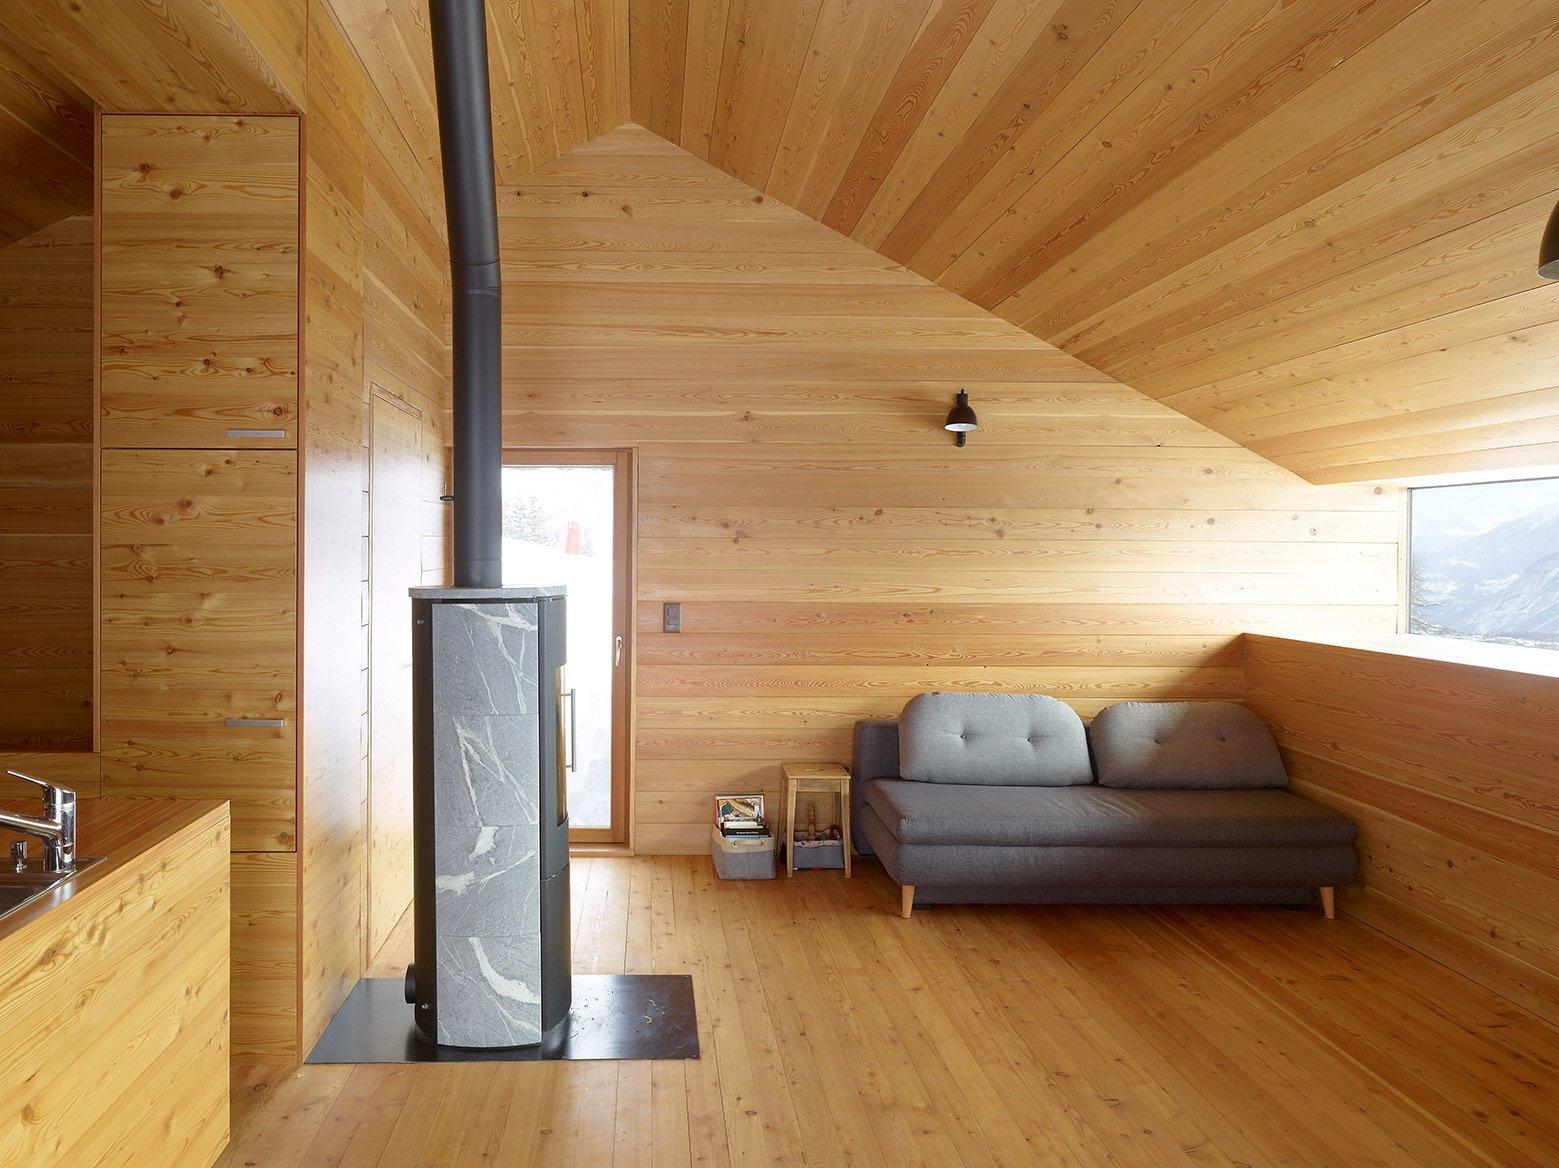 Gaudin House   Small Cabin   Savioz Fabrizzi Architectes   Switzerland    Living Area   Humble